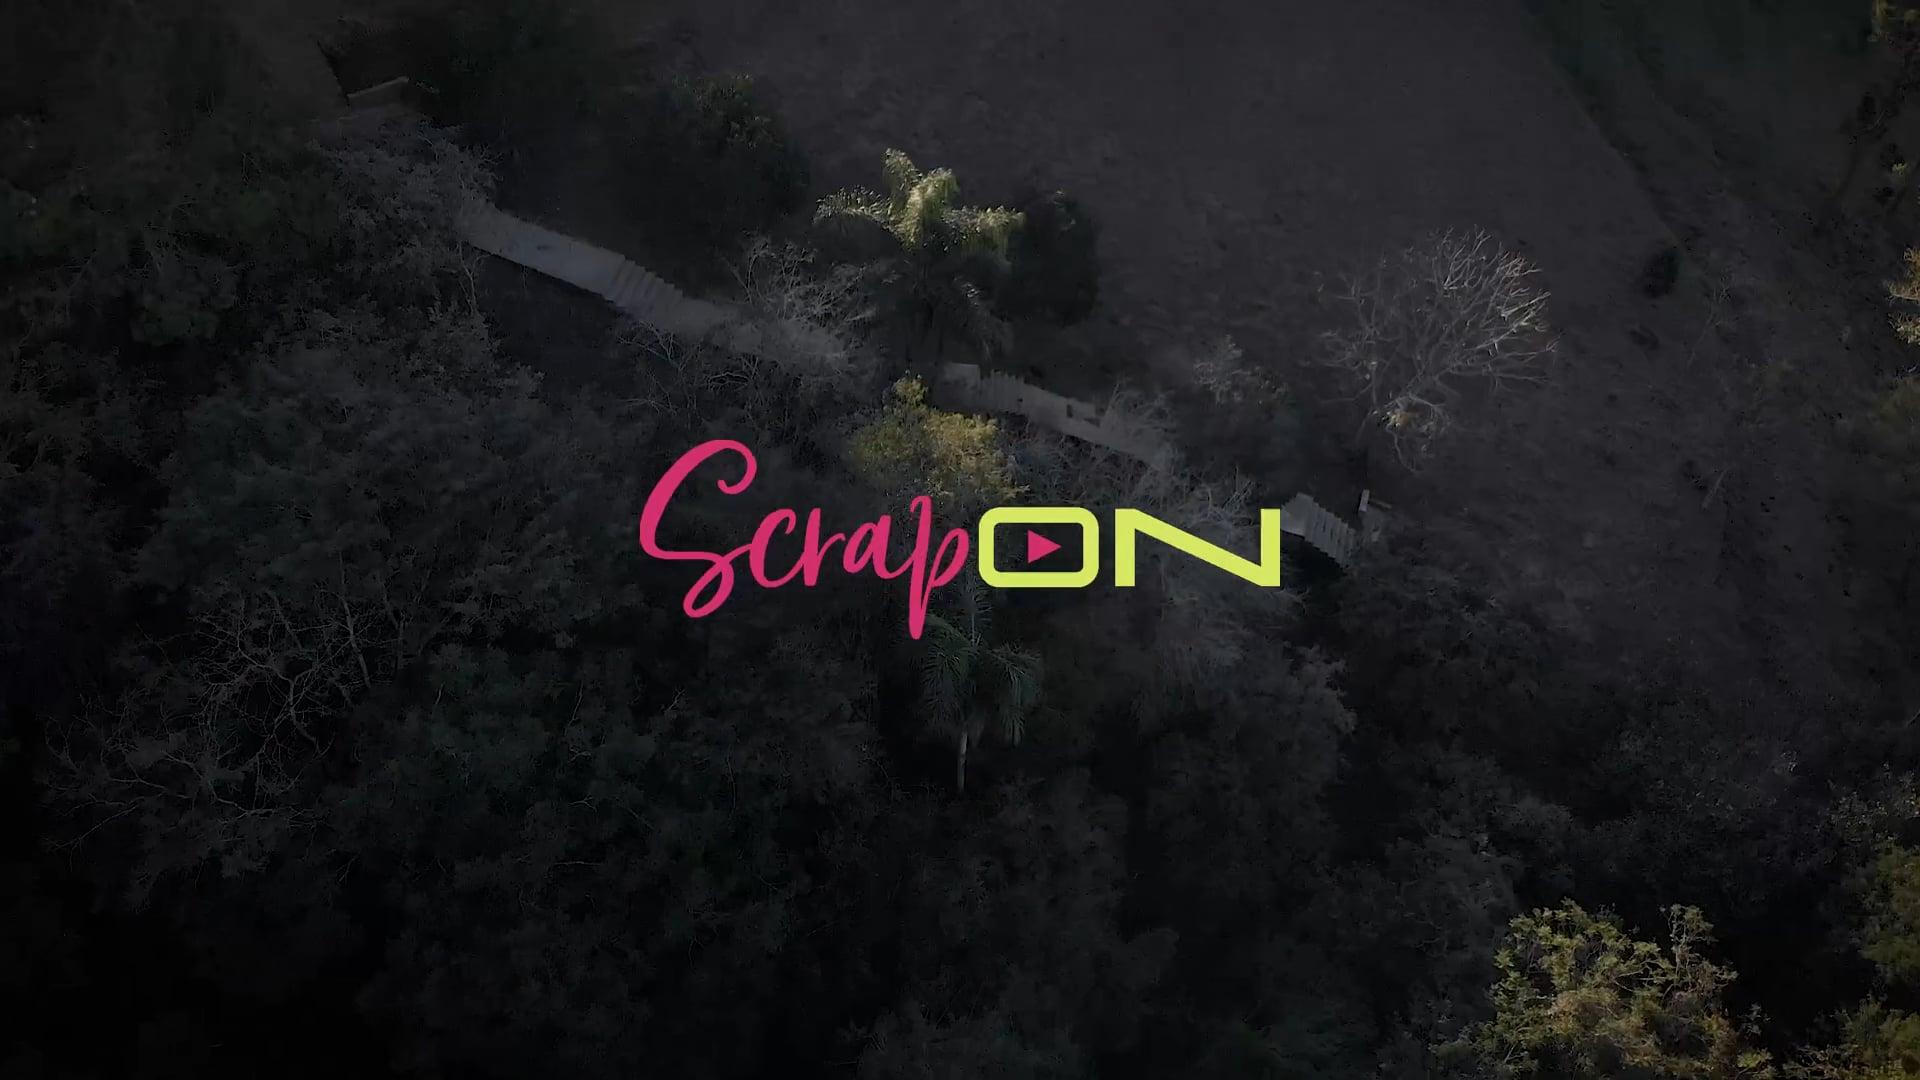 ScrapON - Teaser